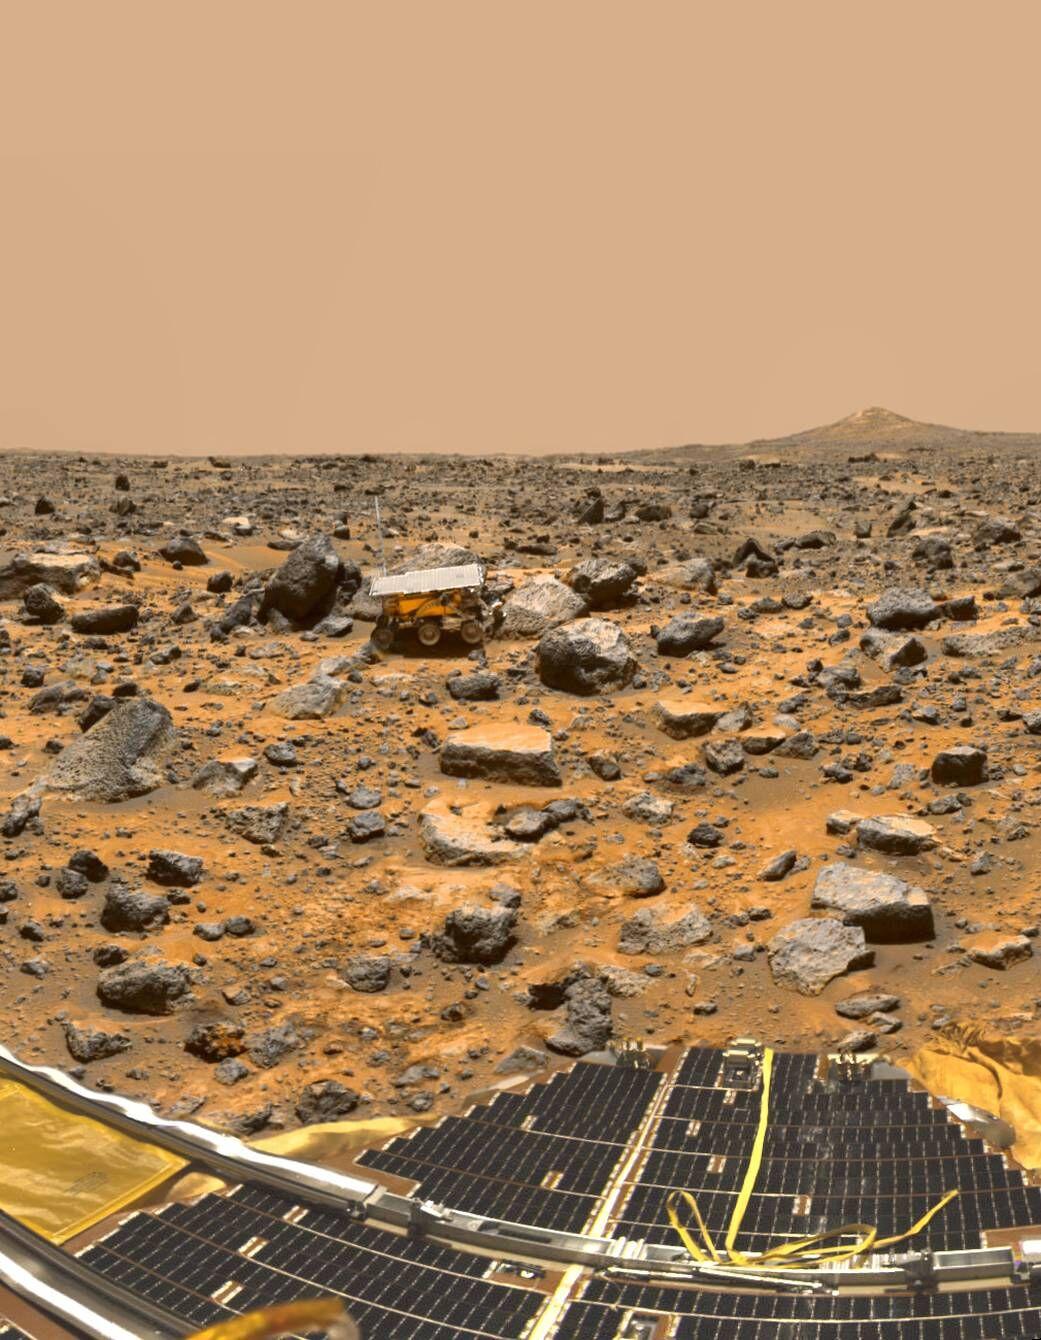 Remembring Mars pathfinder Mission